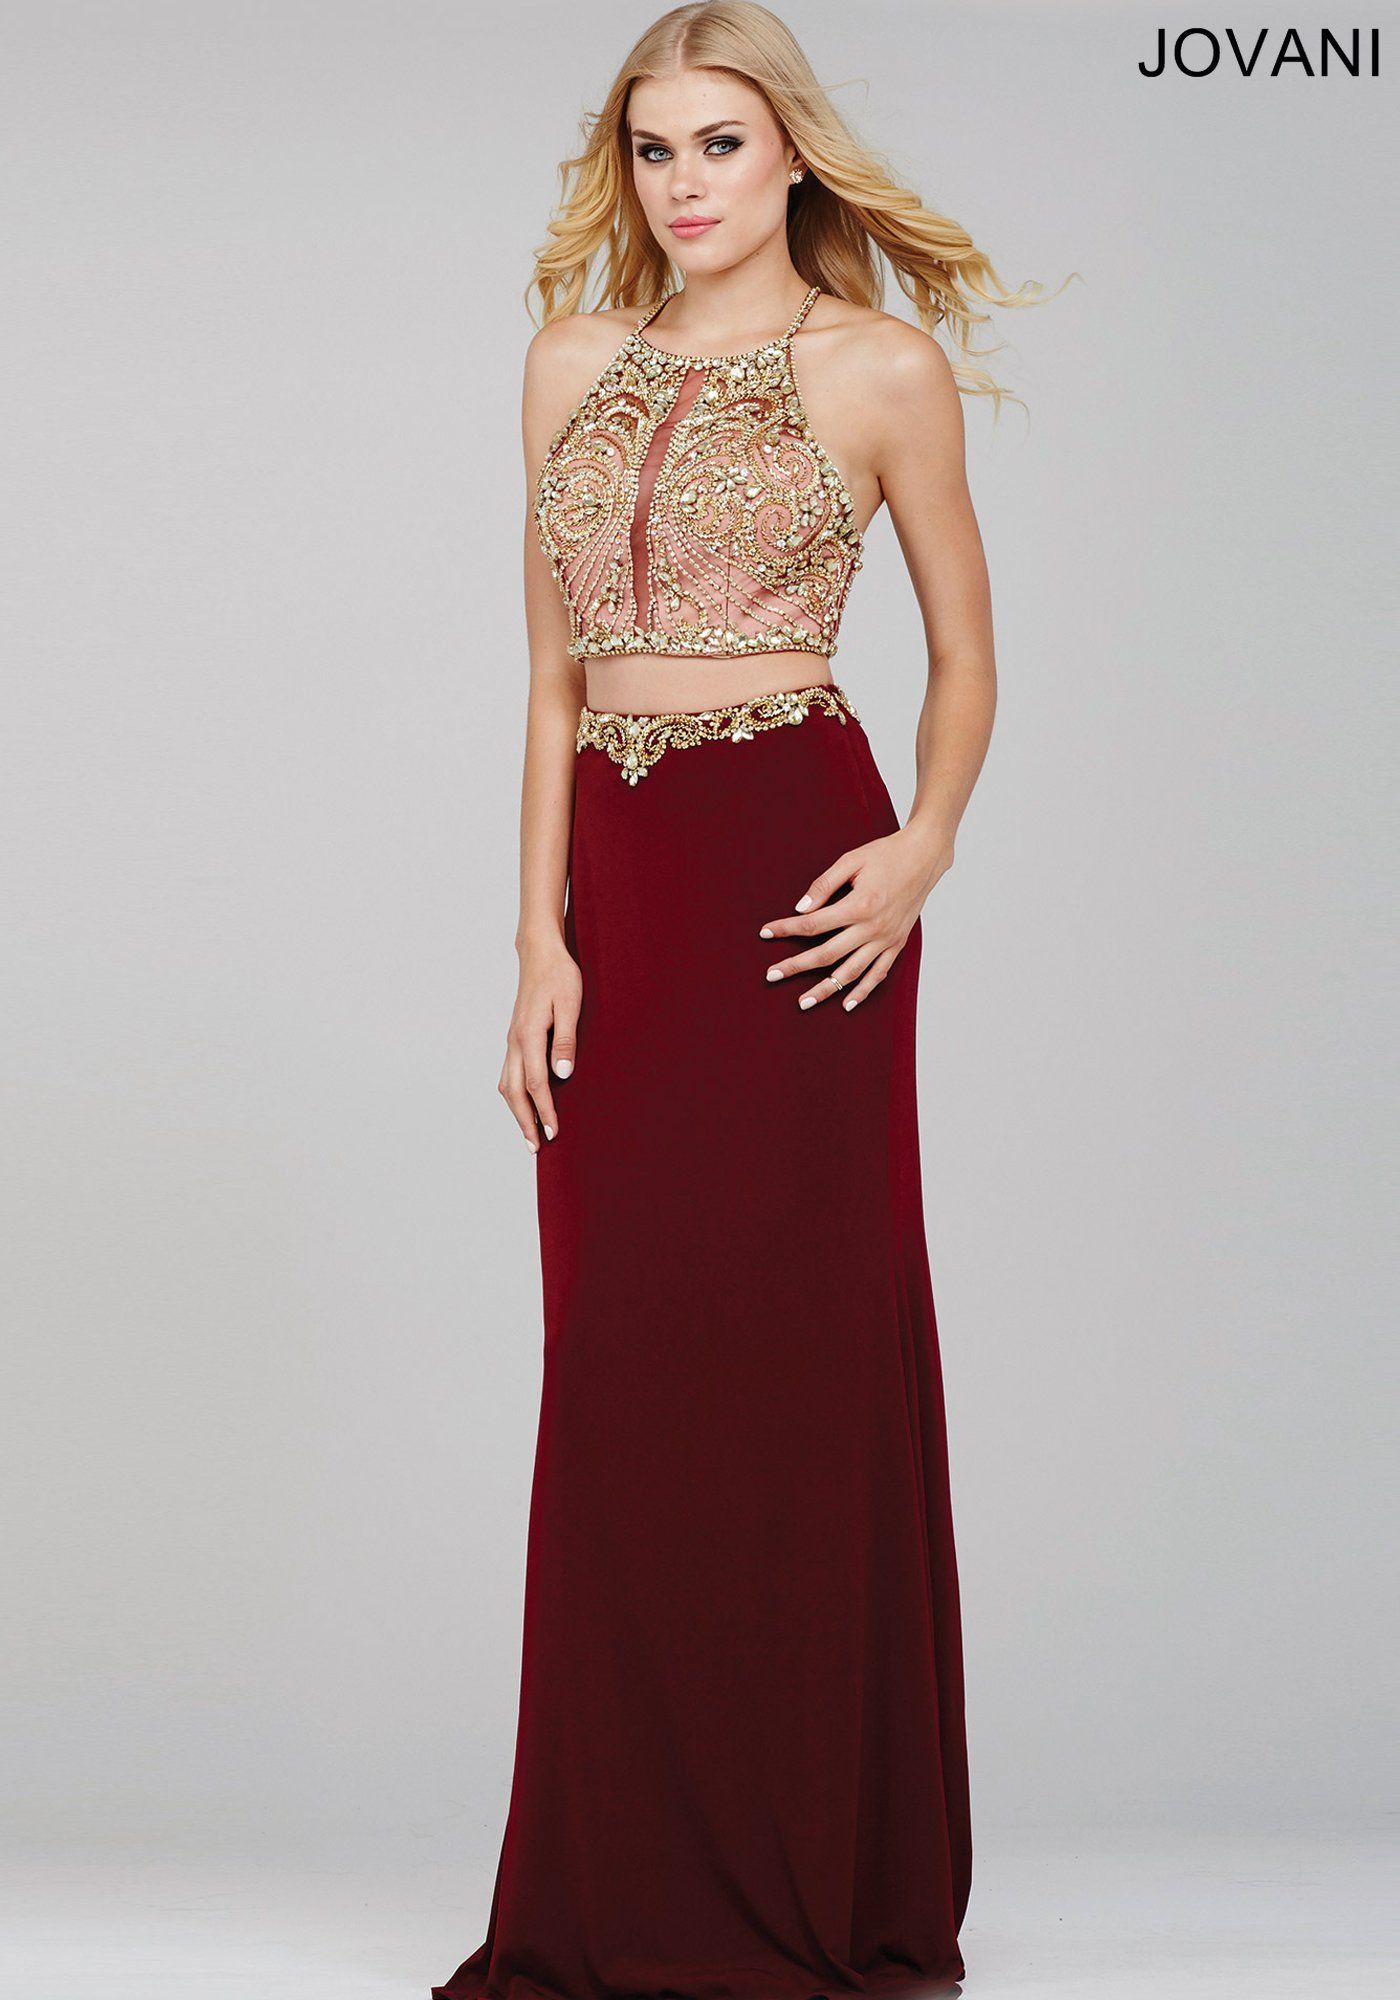 ce71f520fc1 Burgundy Jersey Two-Piece Prom Dress 33493 - Prom Dresses